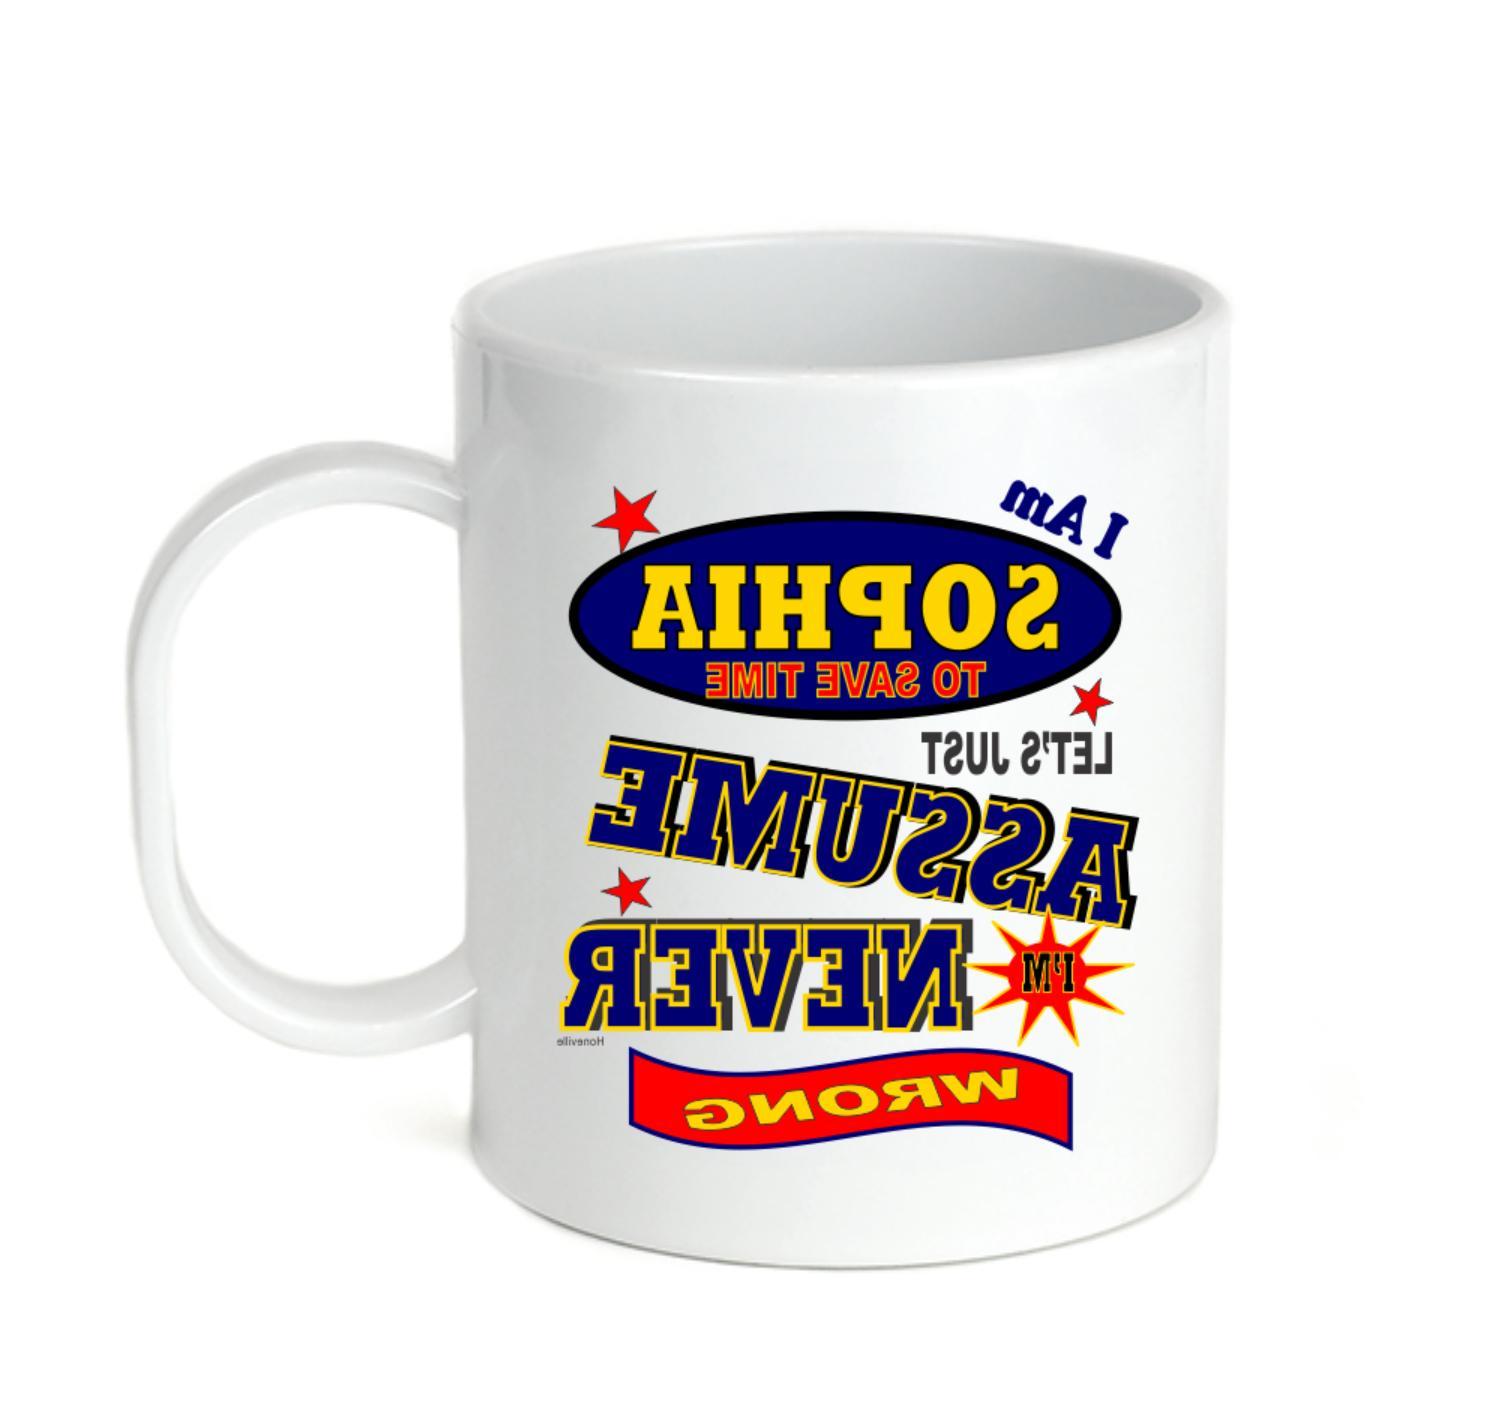 Coffee Cup Mug Travel 11 15 I Am Sophia Let's Just Assume Ne